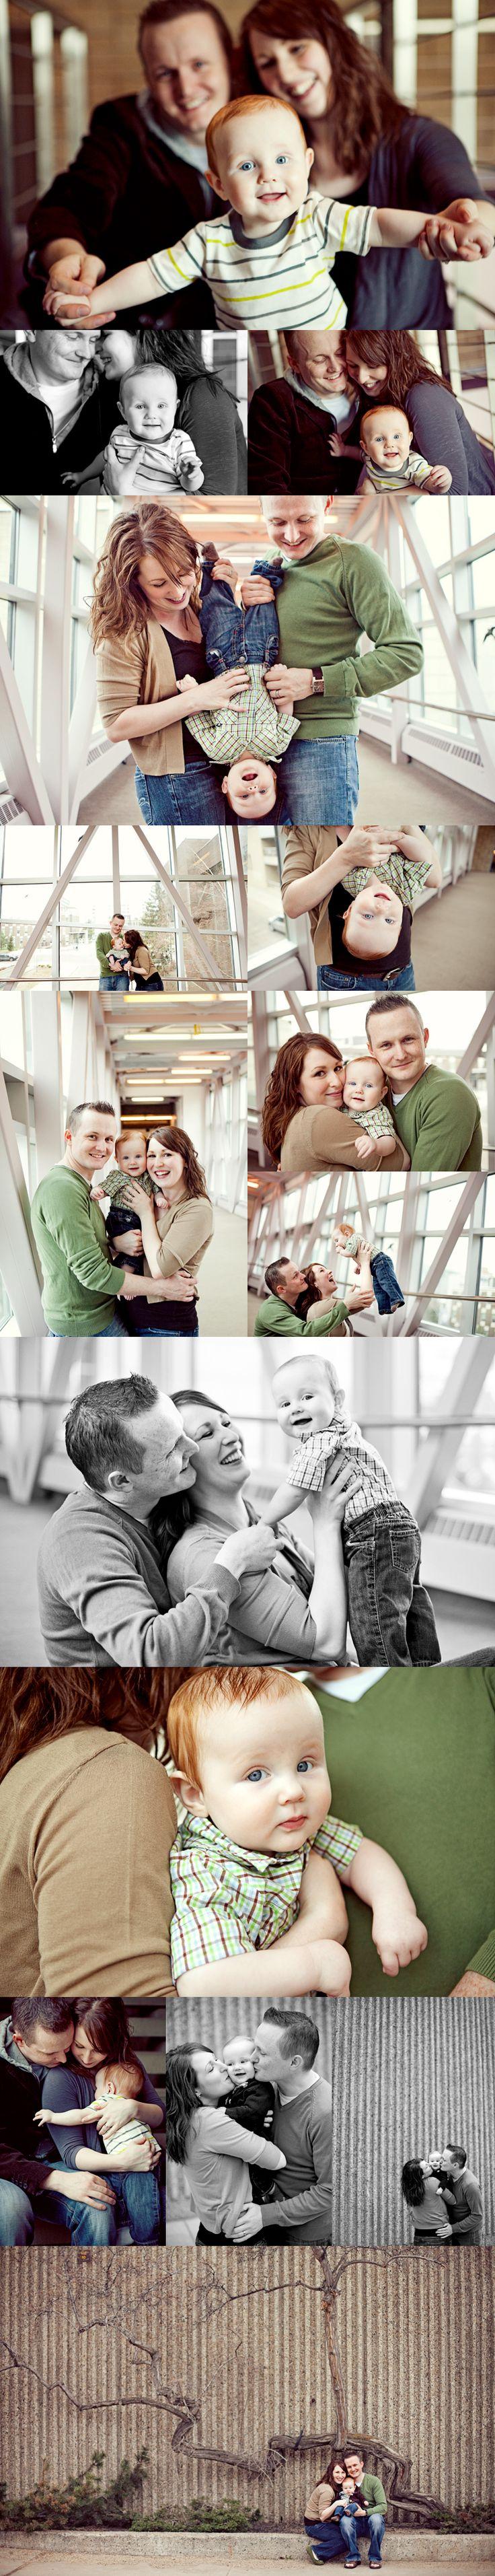 ideas for @Meagan Finnegan Smith's family photo shoot next week.